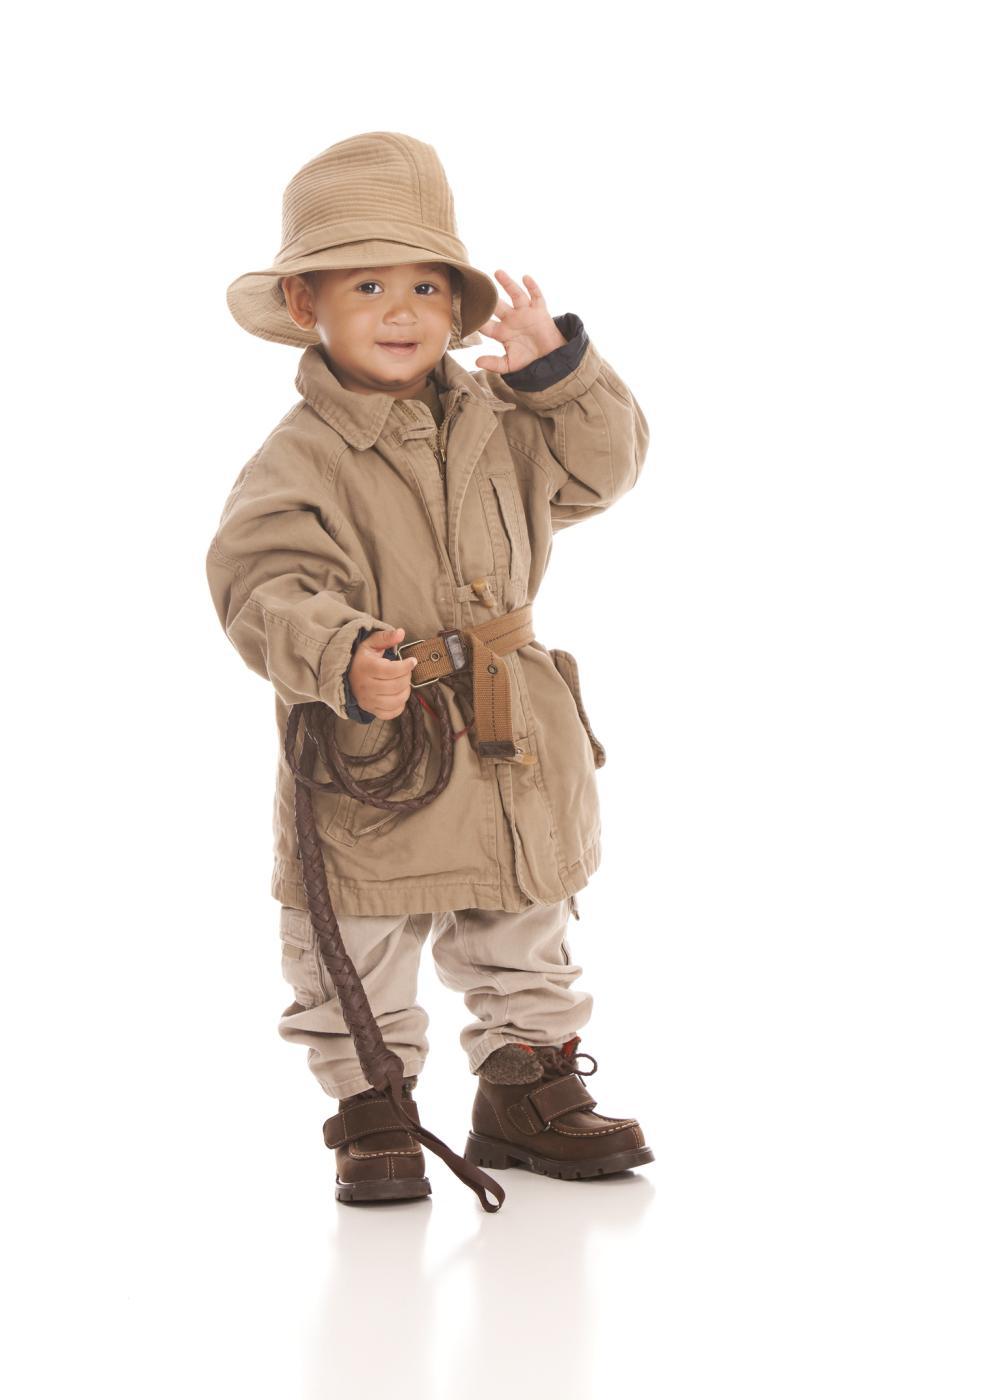 Indiana jones halloween costume for boys